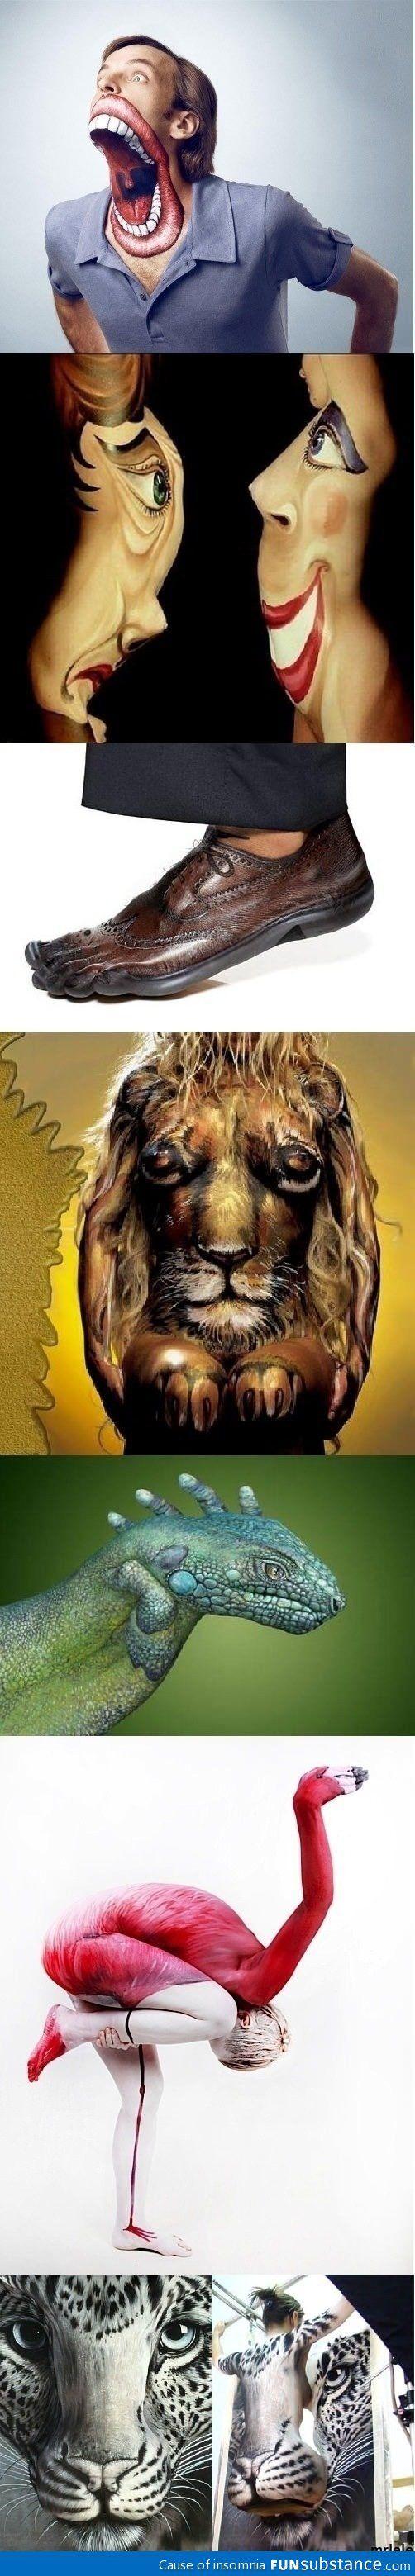 Awesome human art illusions